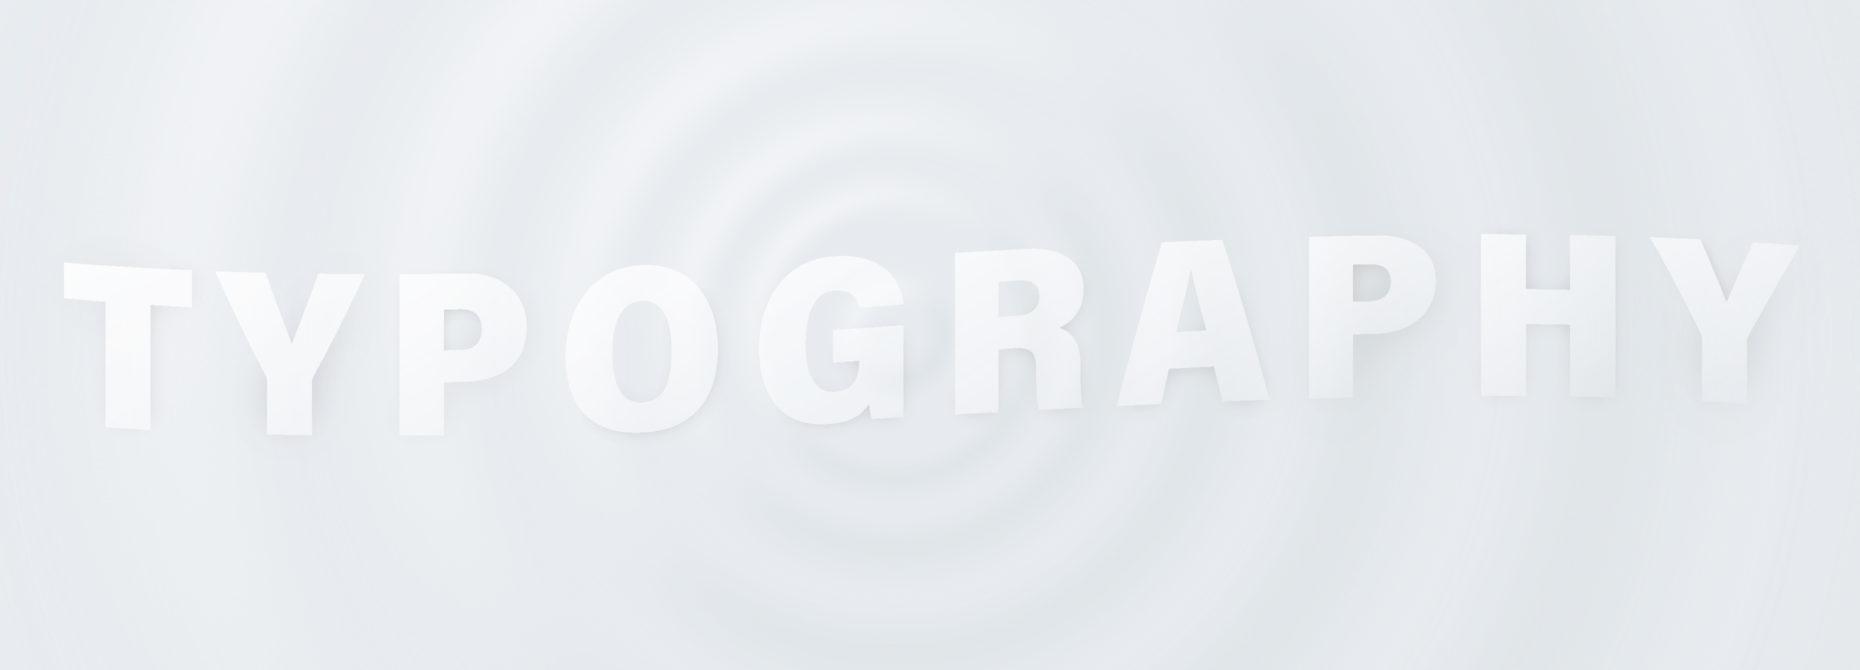 <span>Typography</span>